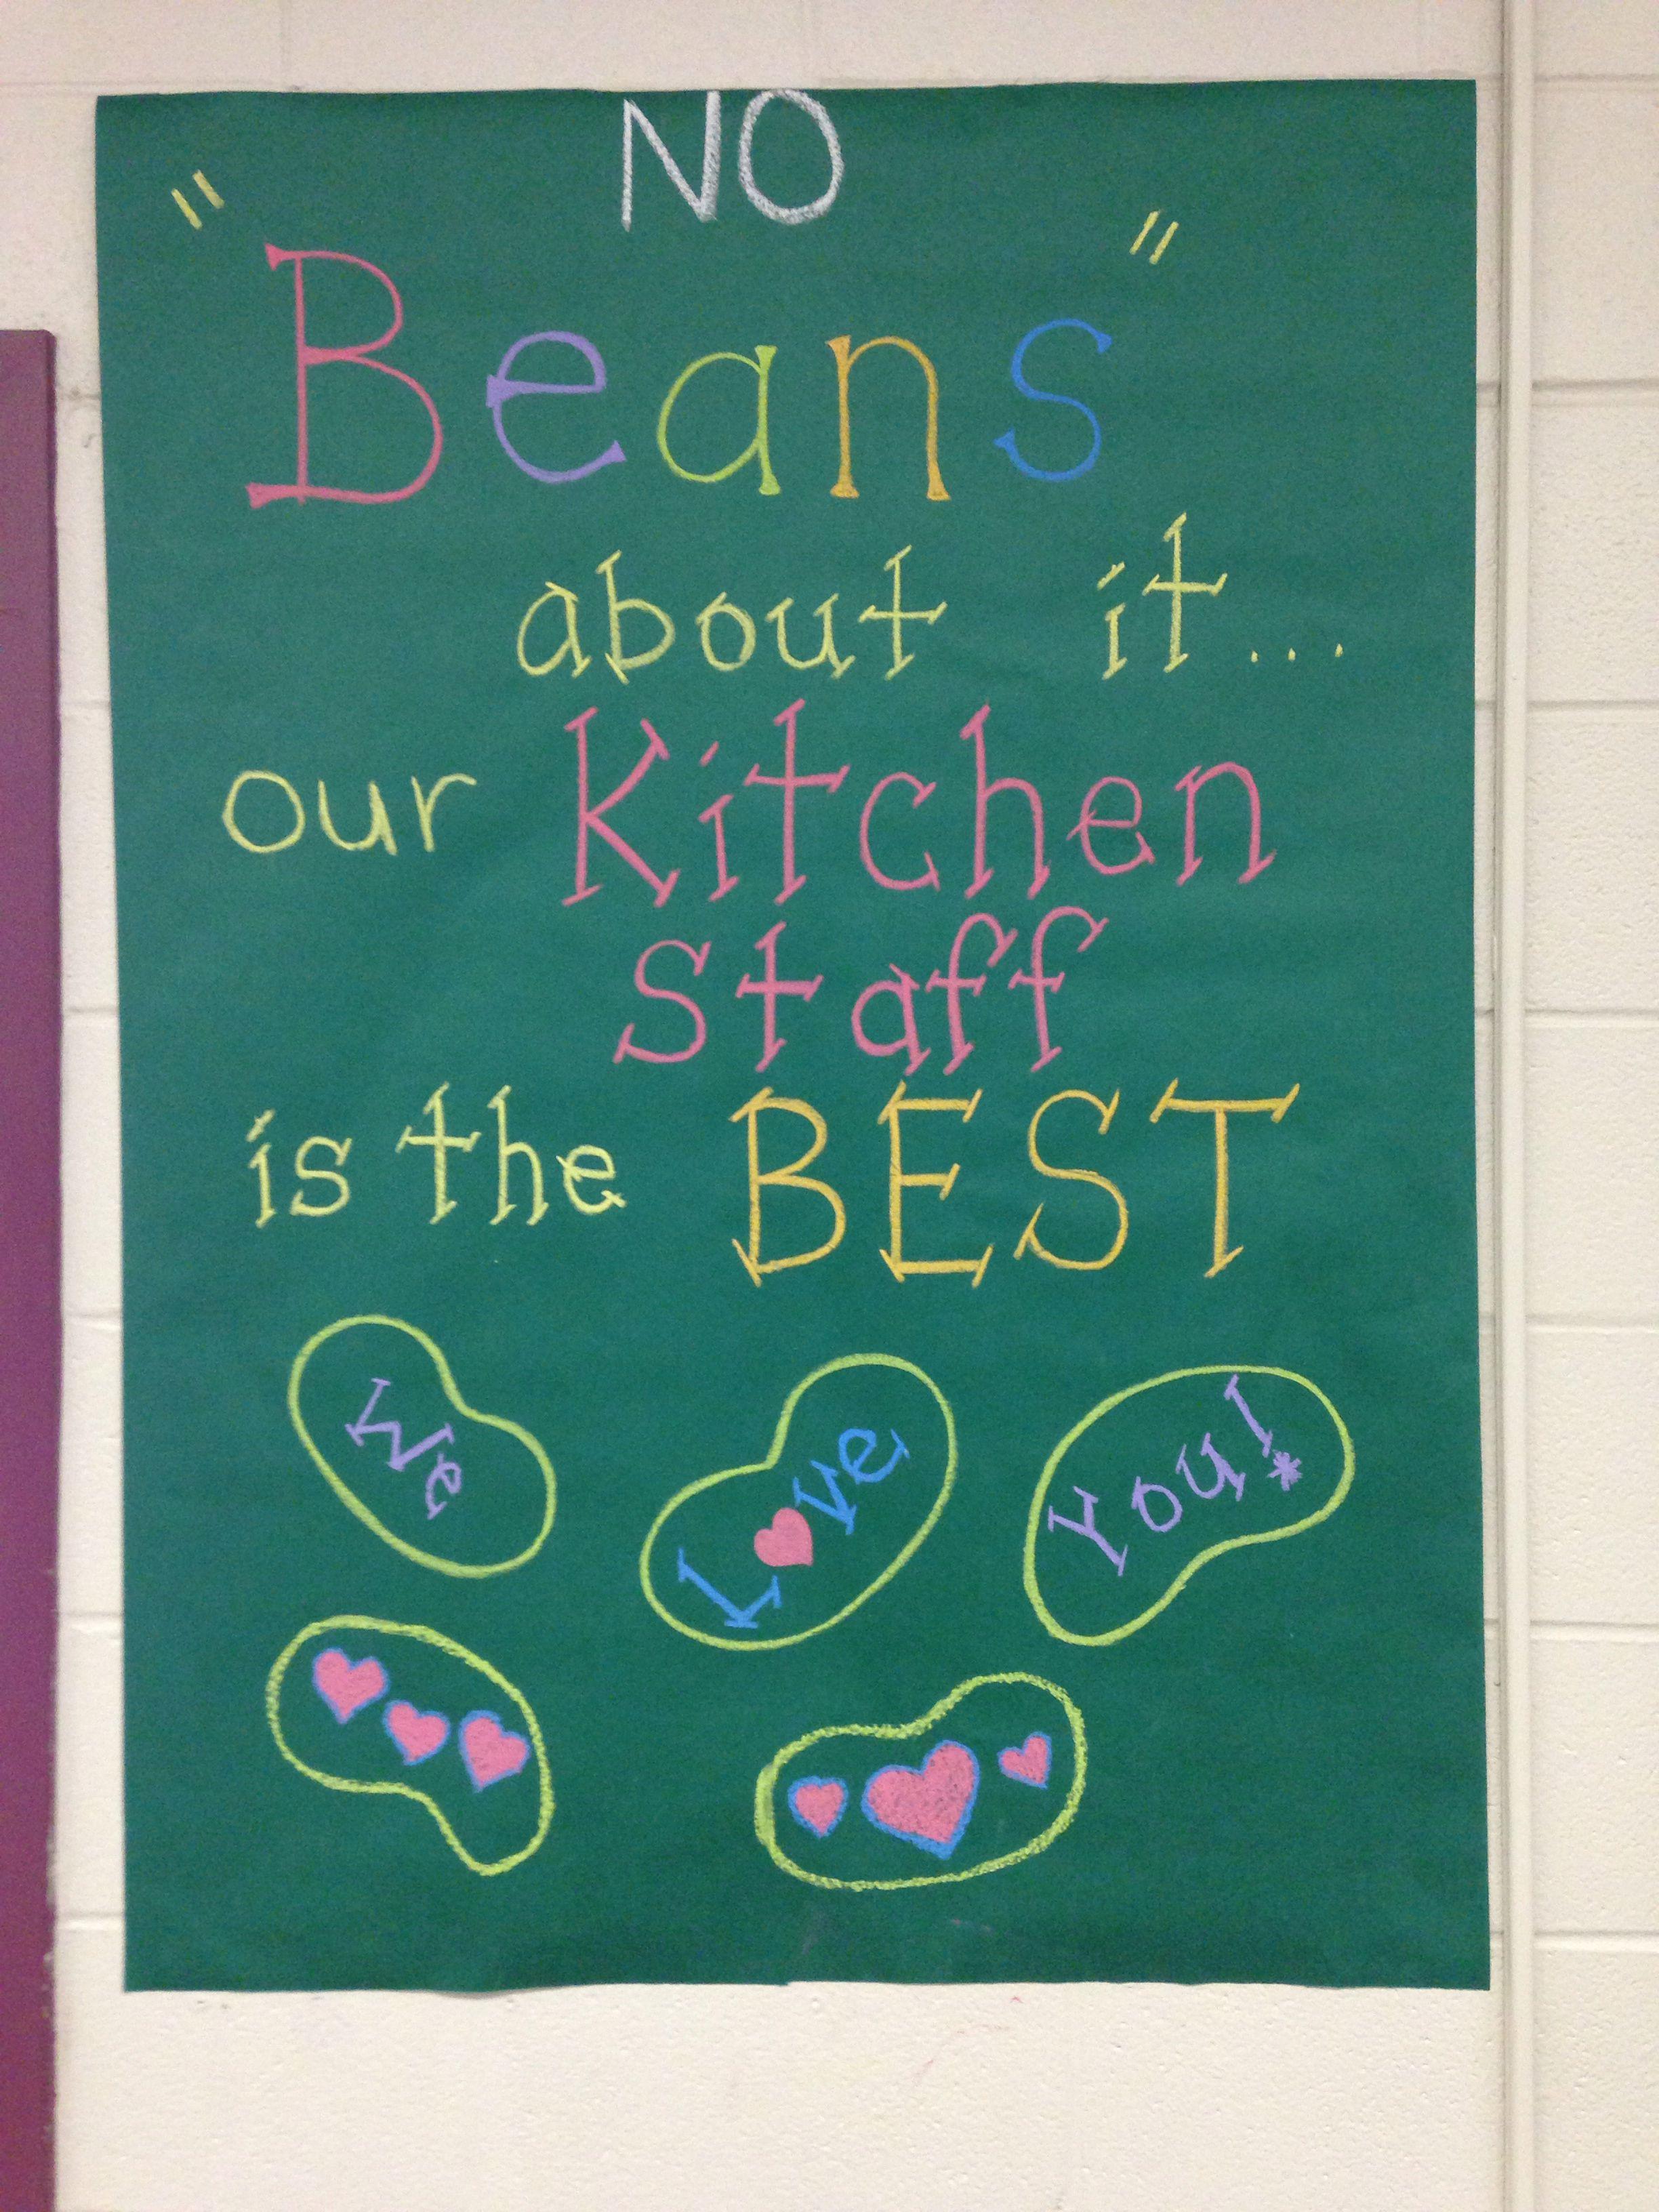 Lunch Lady AKA Kitchen Staff Appreciation posters